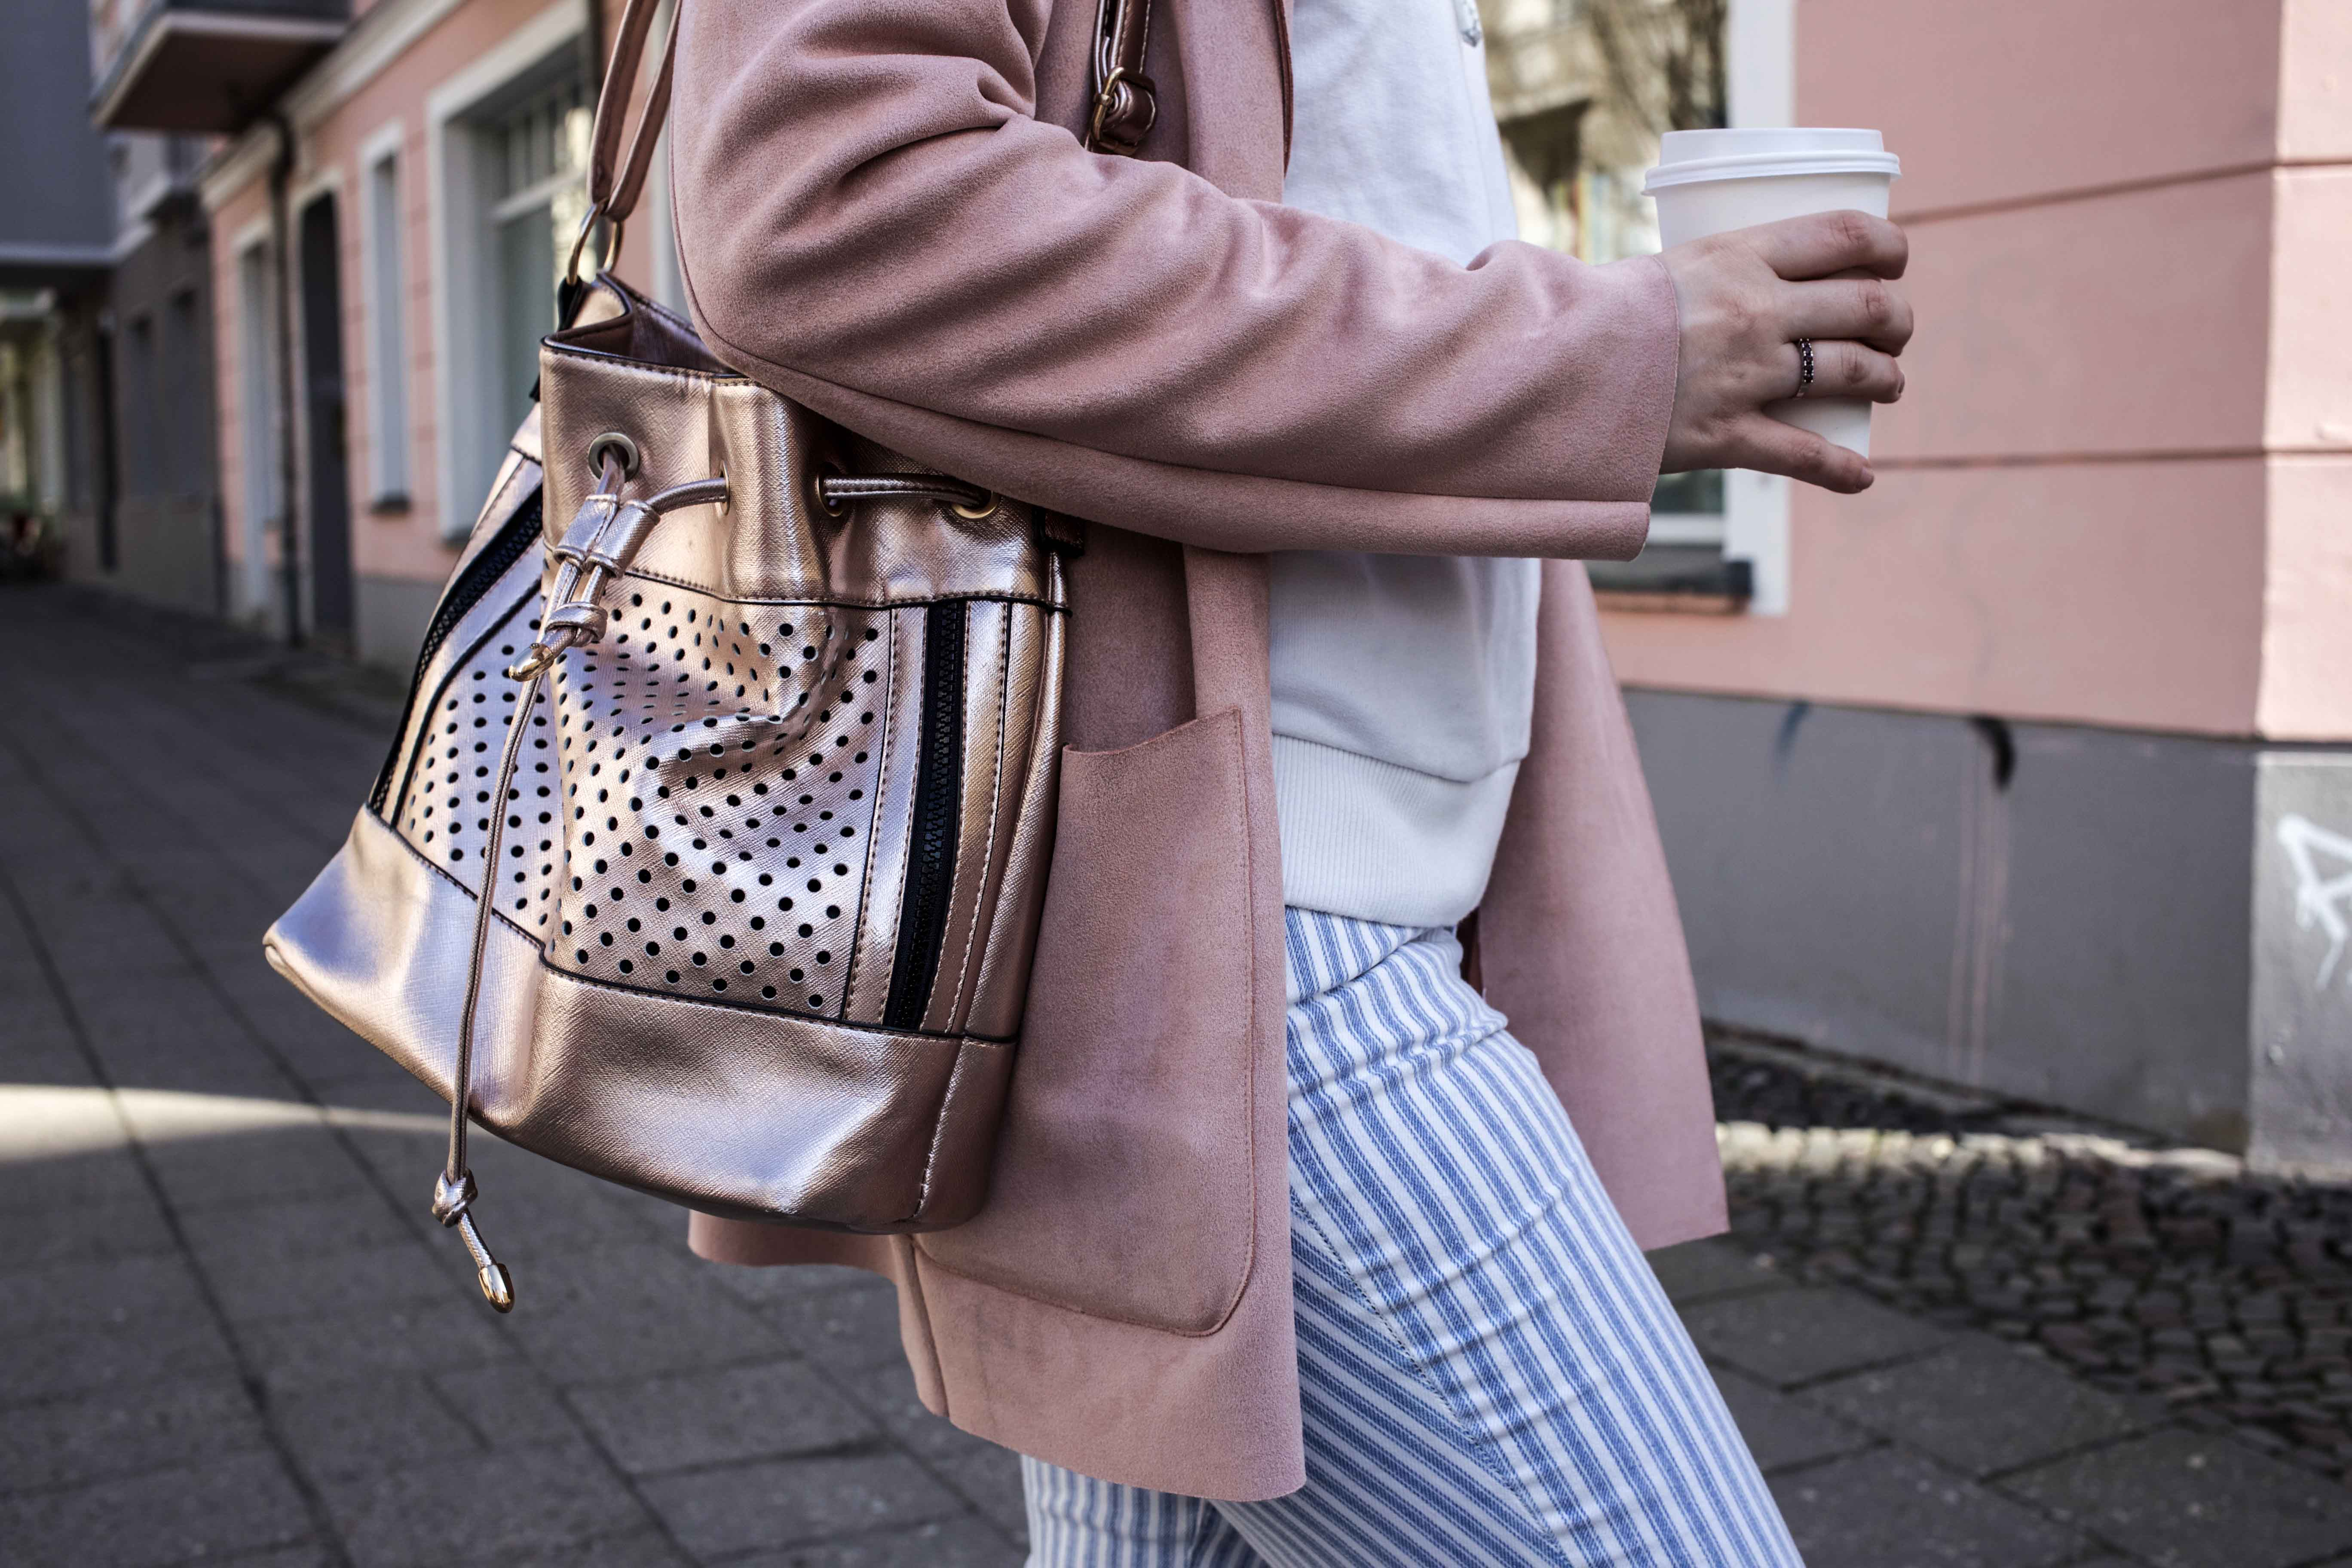 spring-look-frühlingsoutfit-rosegold-rosa-gestreifte-jeans-prenzlauer-berg_5234